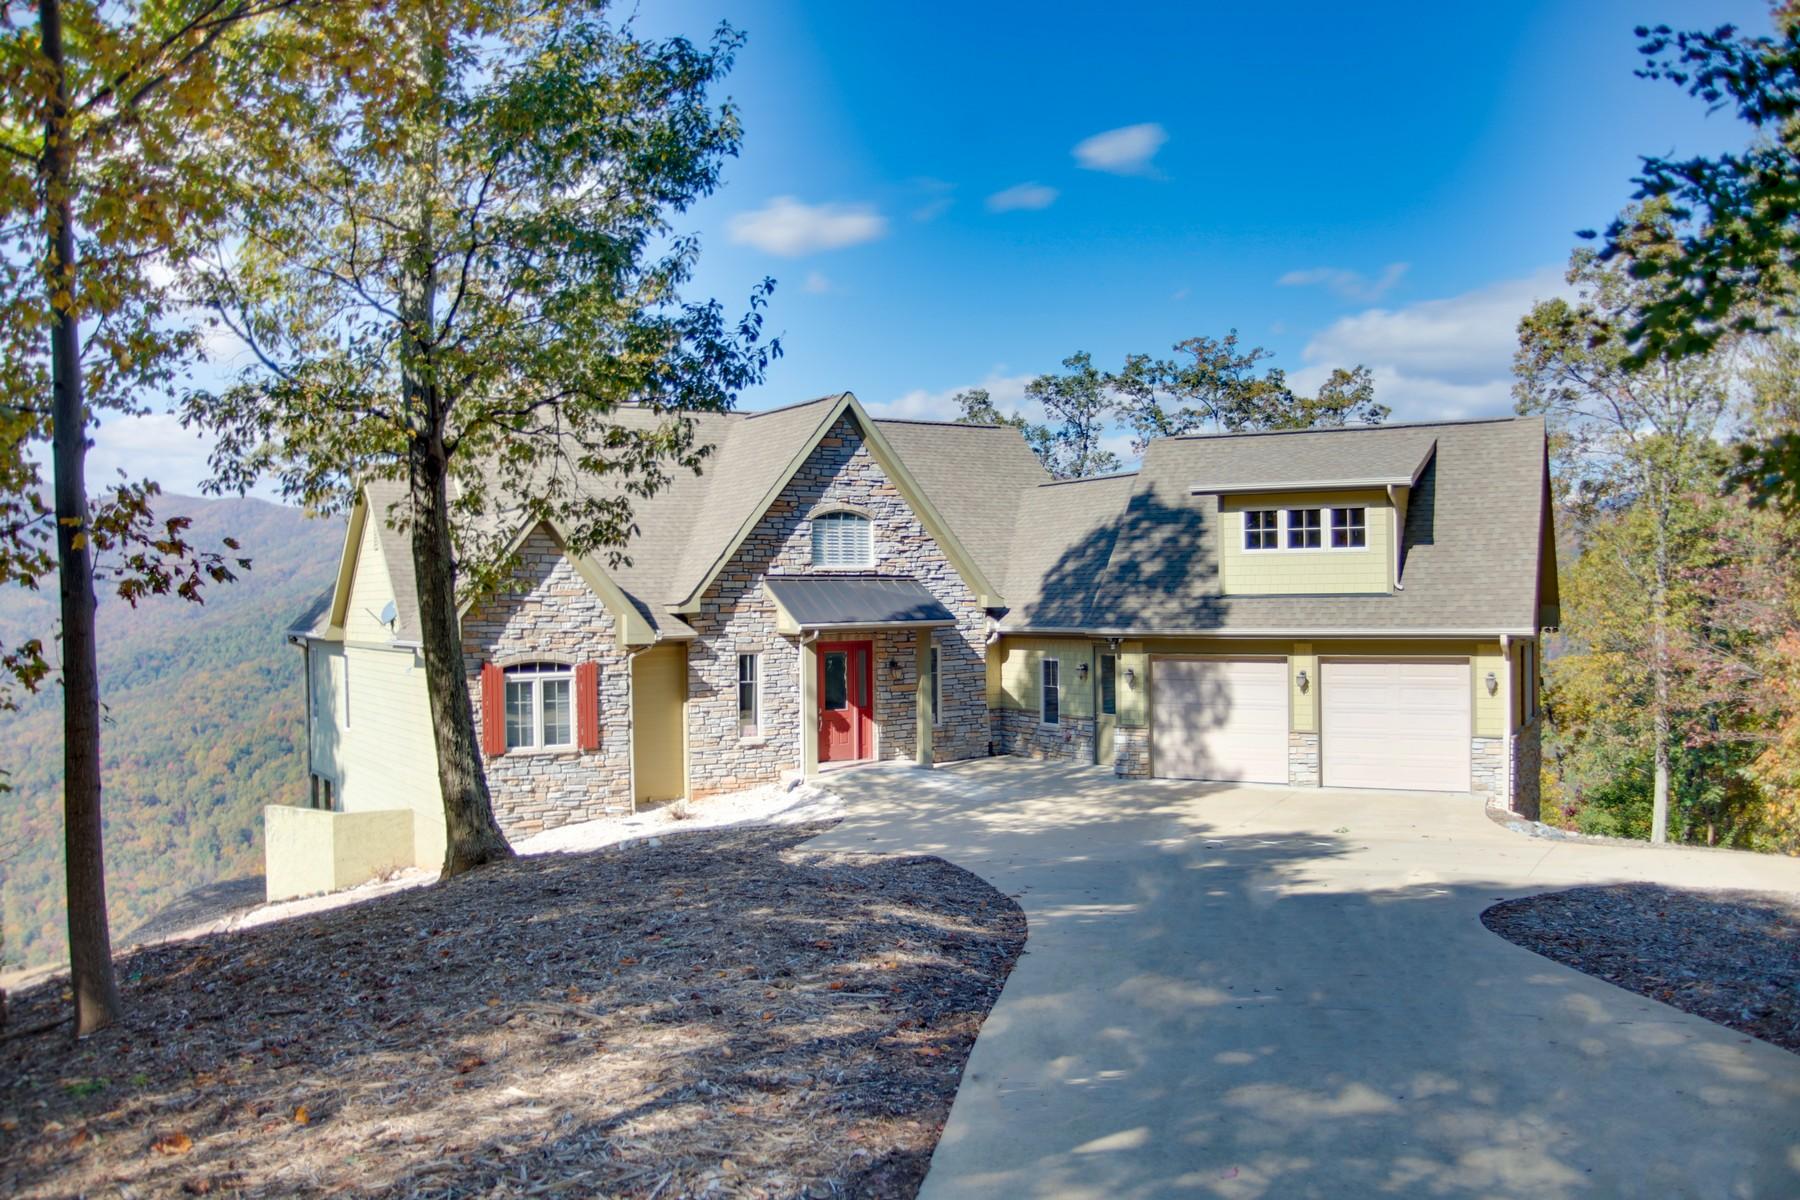 Single Family Homes for Active at Remarkable Mountain Home 231 Tatanka Trail Lake Lure, North Carolina 28746 United States